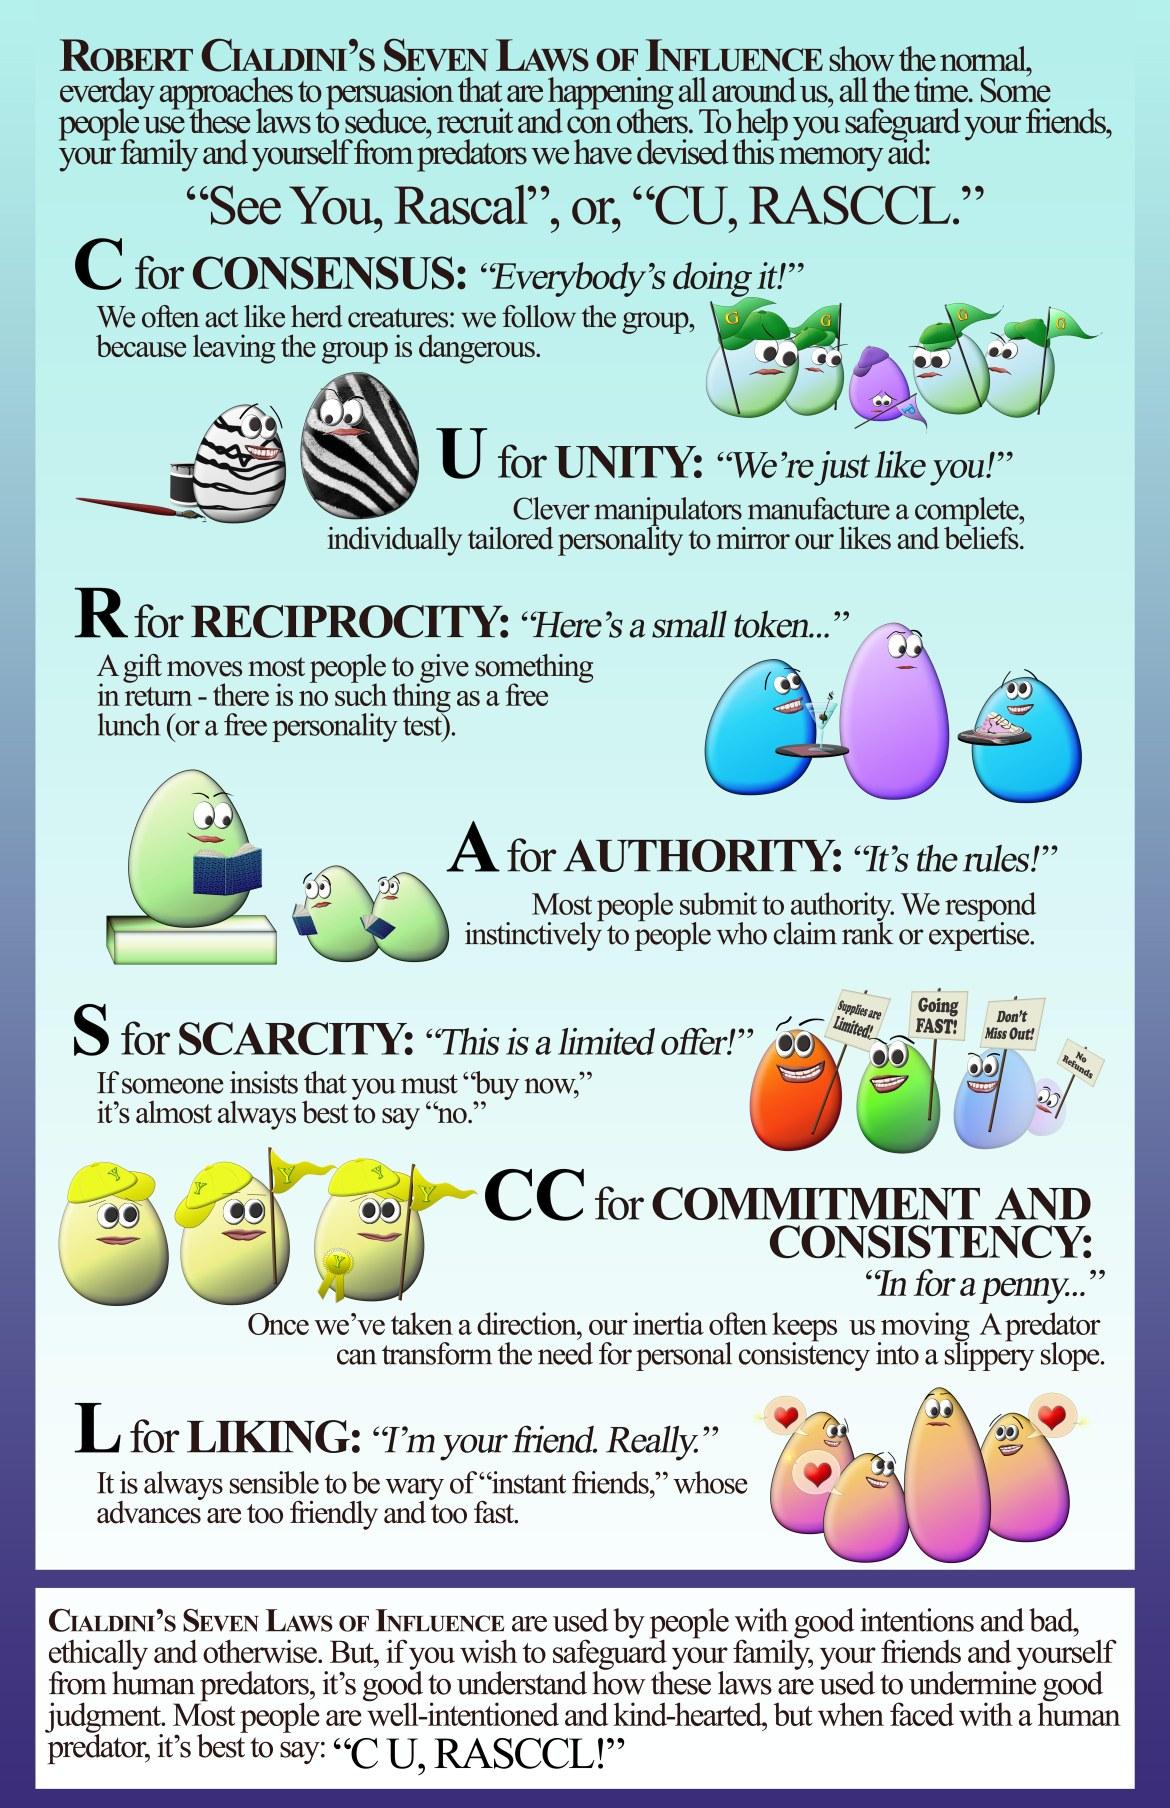 Cialdini's Seven Laws of Influence